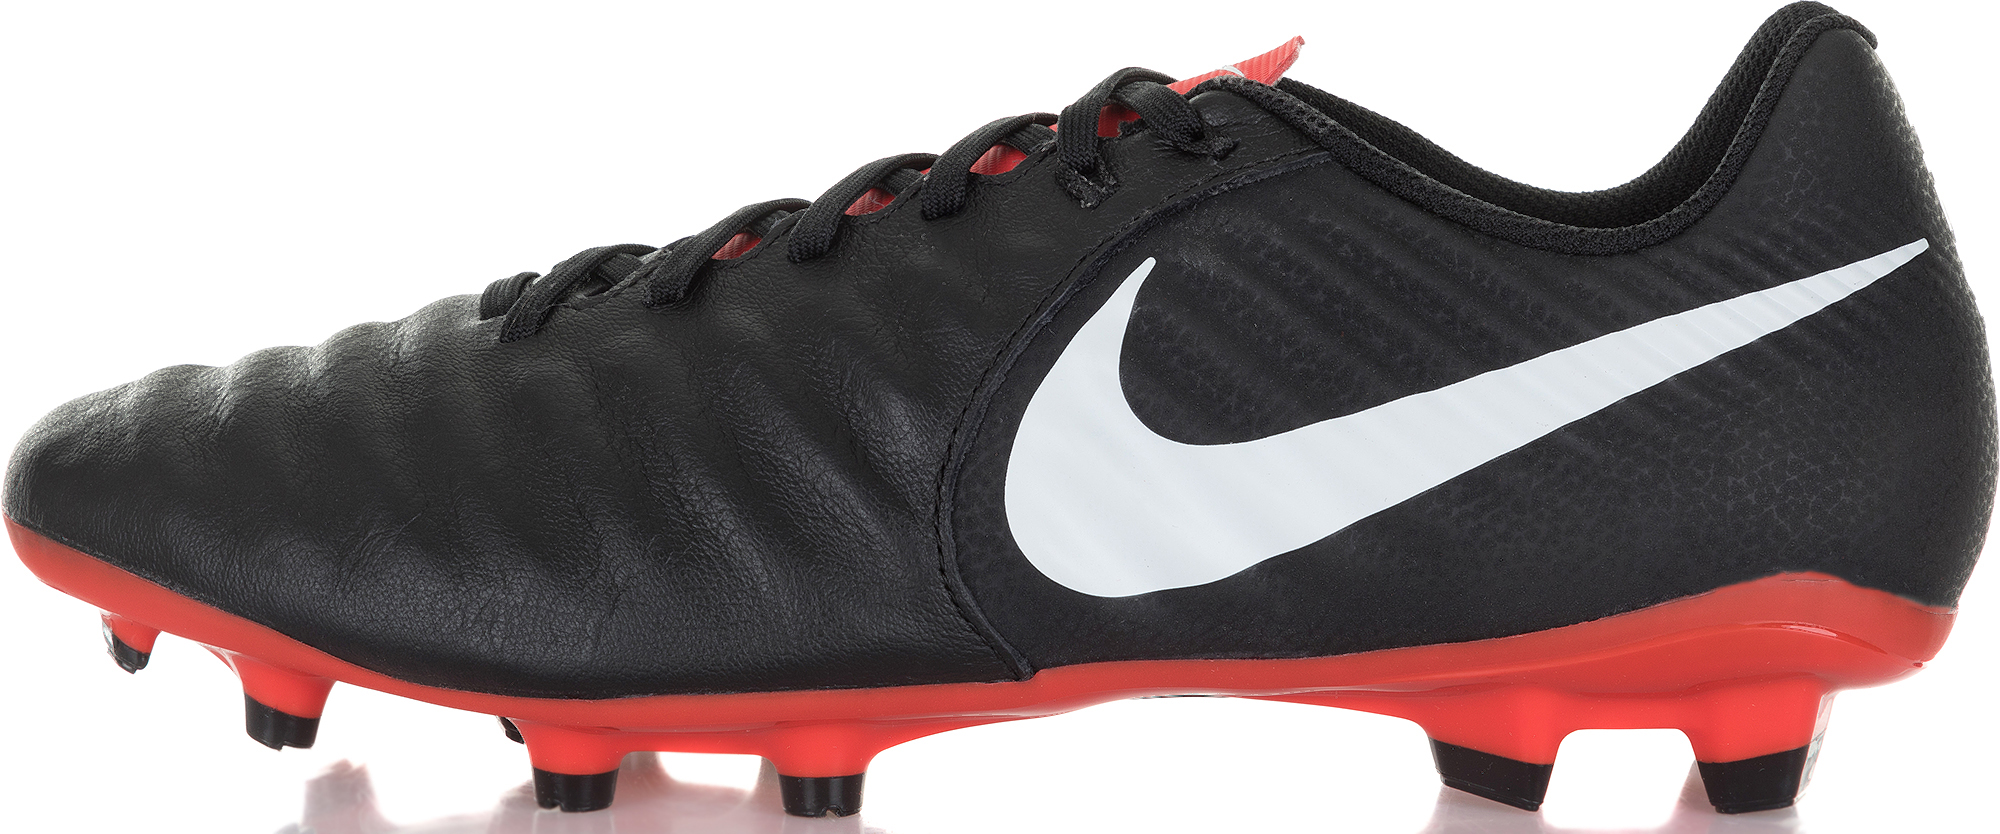 Nike Бутсы мужские Nike Tiempo Legend 7 Academy MG, размер 45